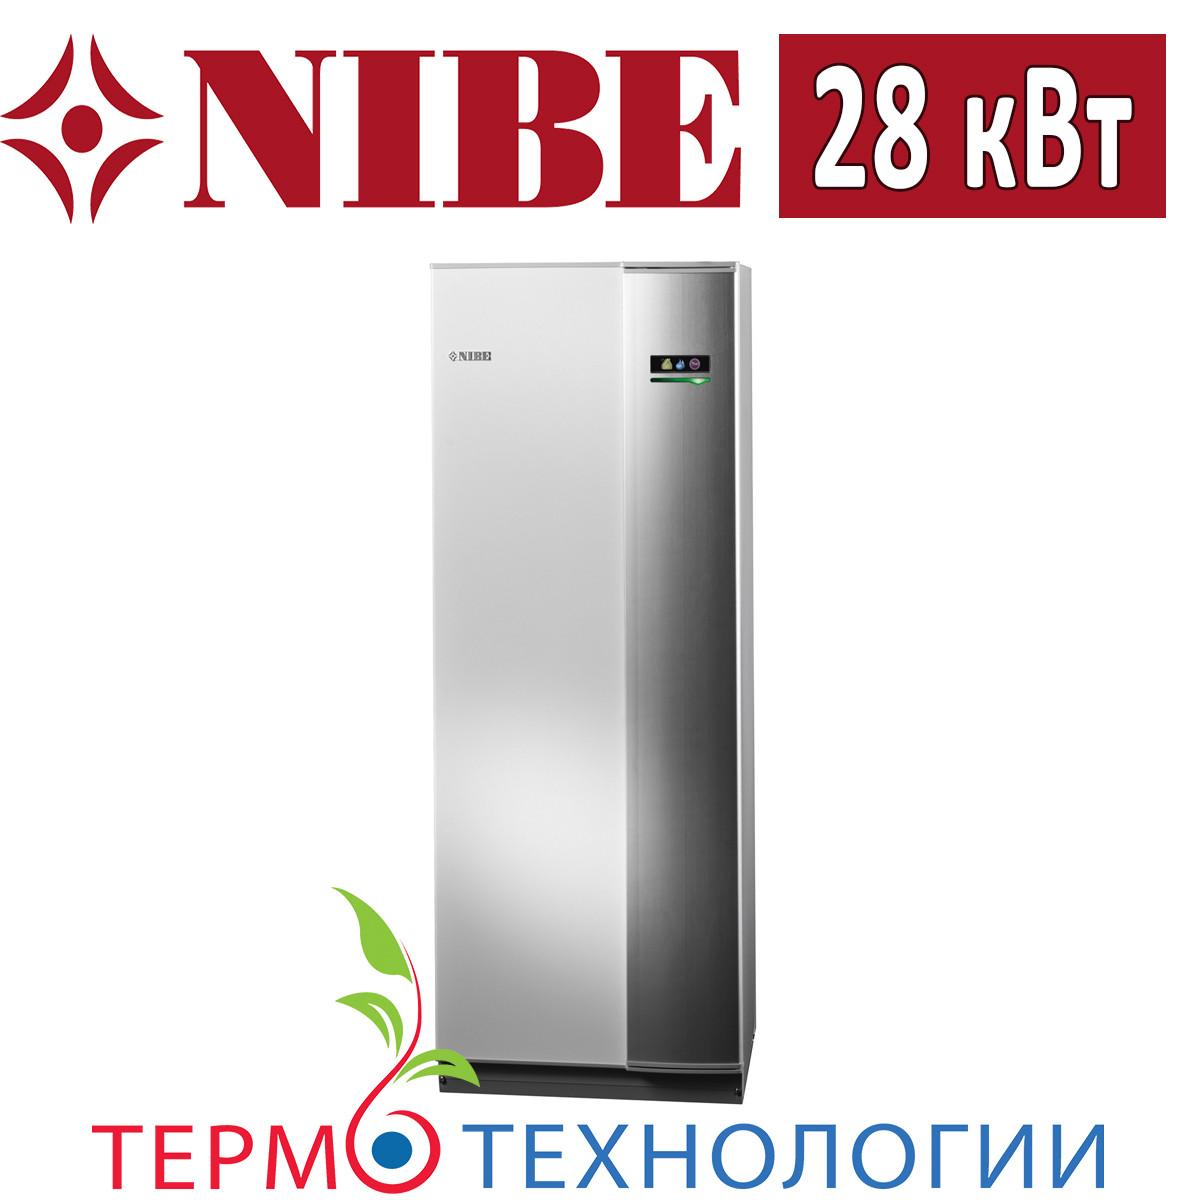 Тепловой насос грунт-вода Nibe F1355-28 28 кВт, 380 В